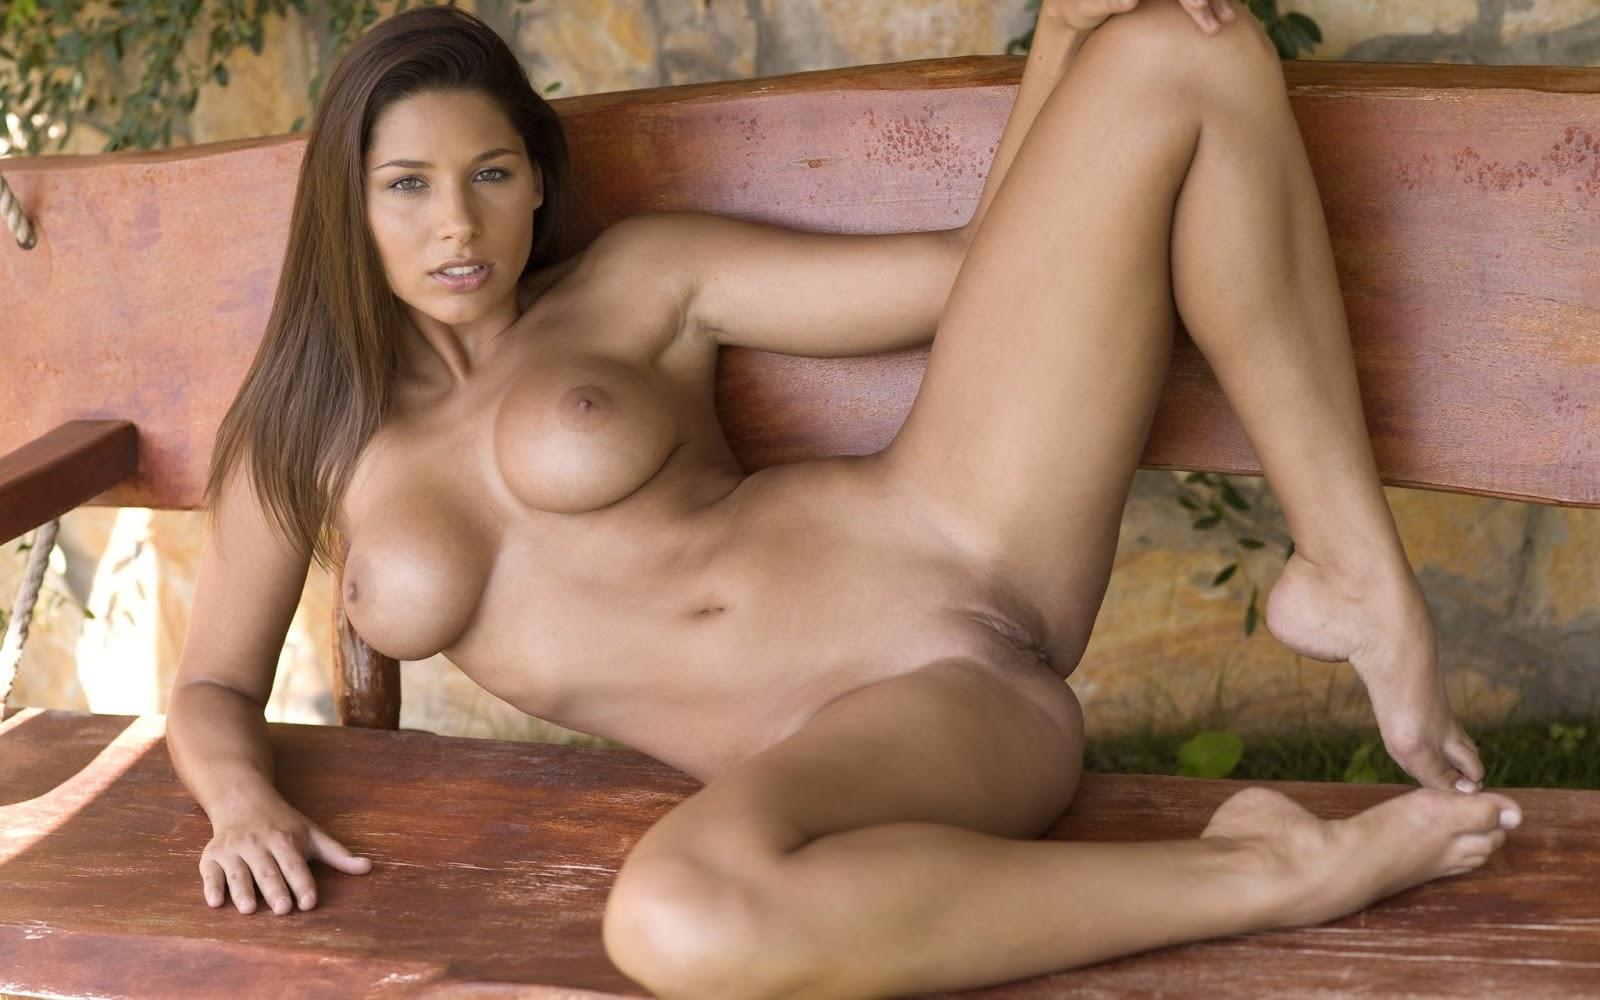 http://1.bp.blogspot.com/-b1X9aD89sQE/UWWrB8n_t-I/AAAAAAAAKBQ/E4ikkVWtbk8/s1600/Sexy_Pussy_HD_Nude_Girl_Naked_Wallpaper.jpg